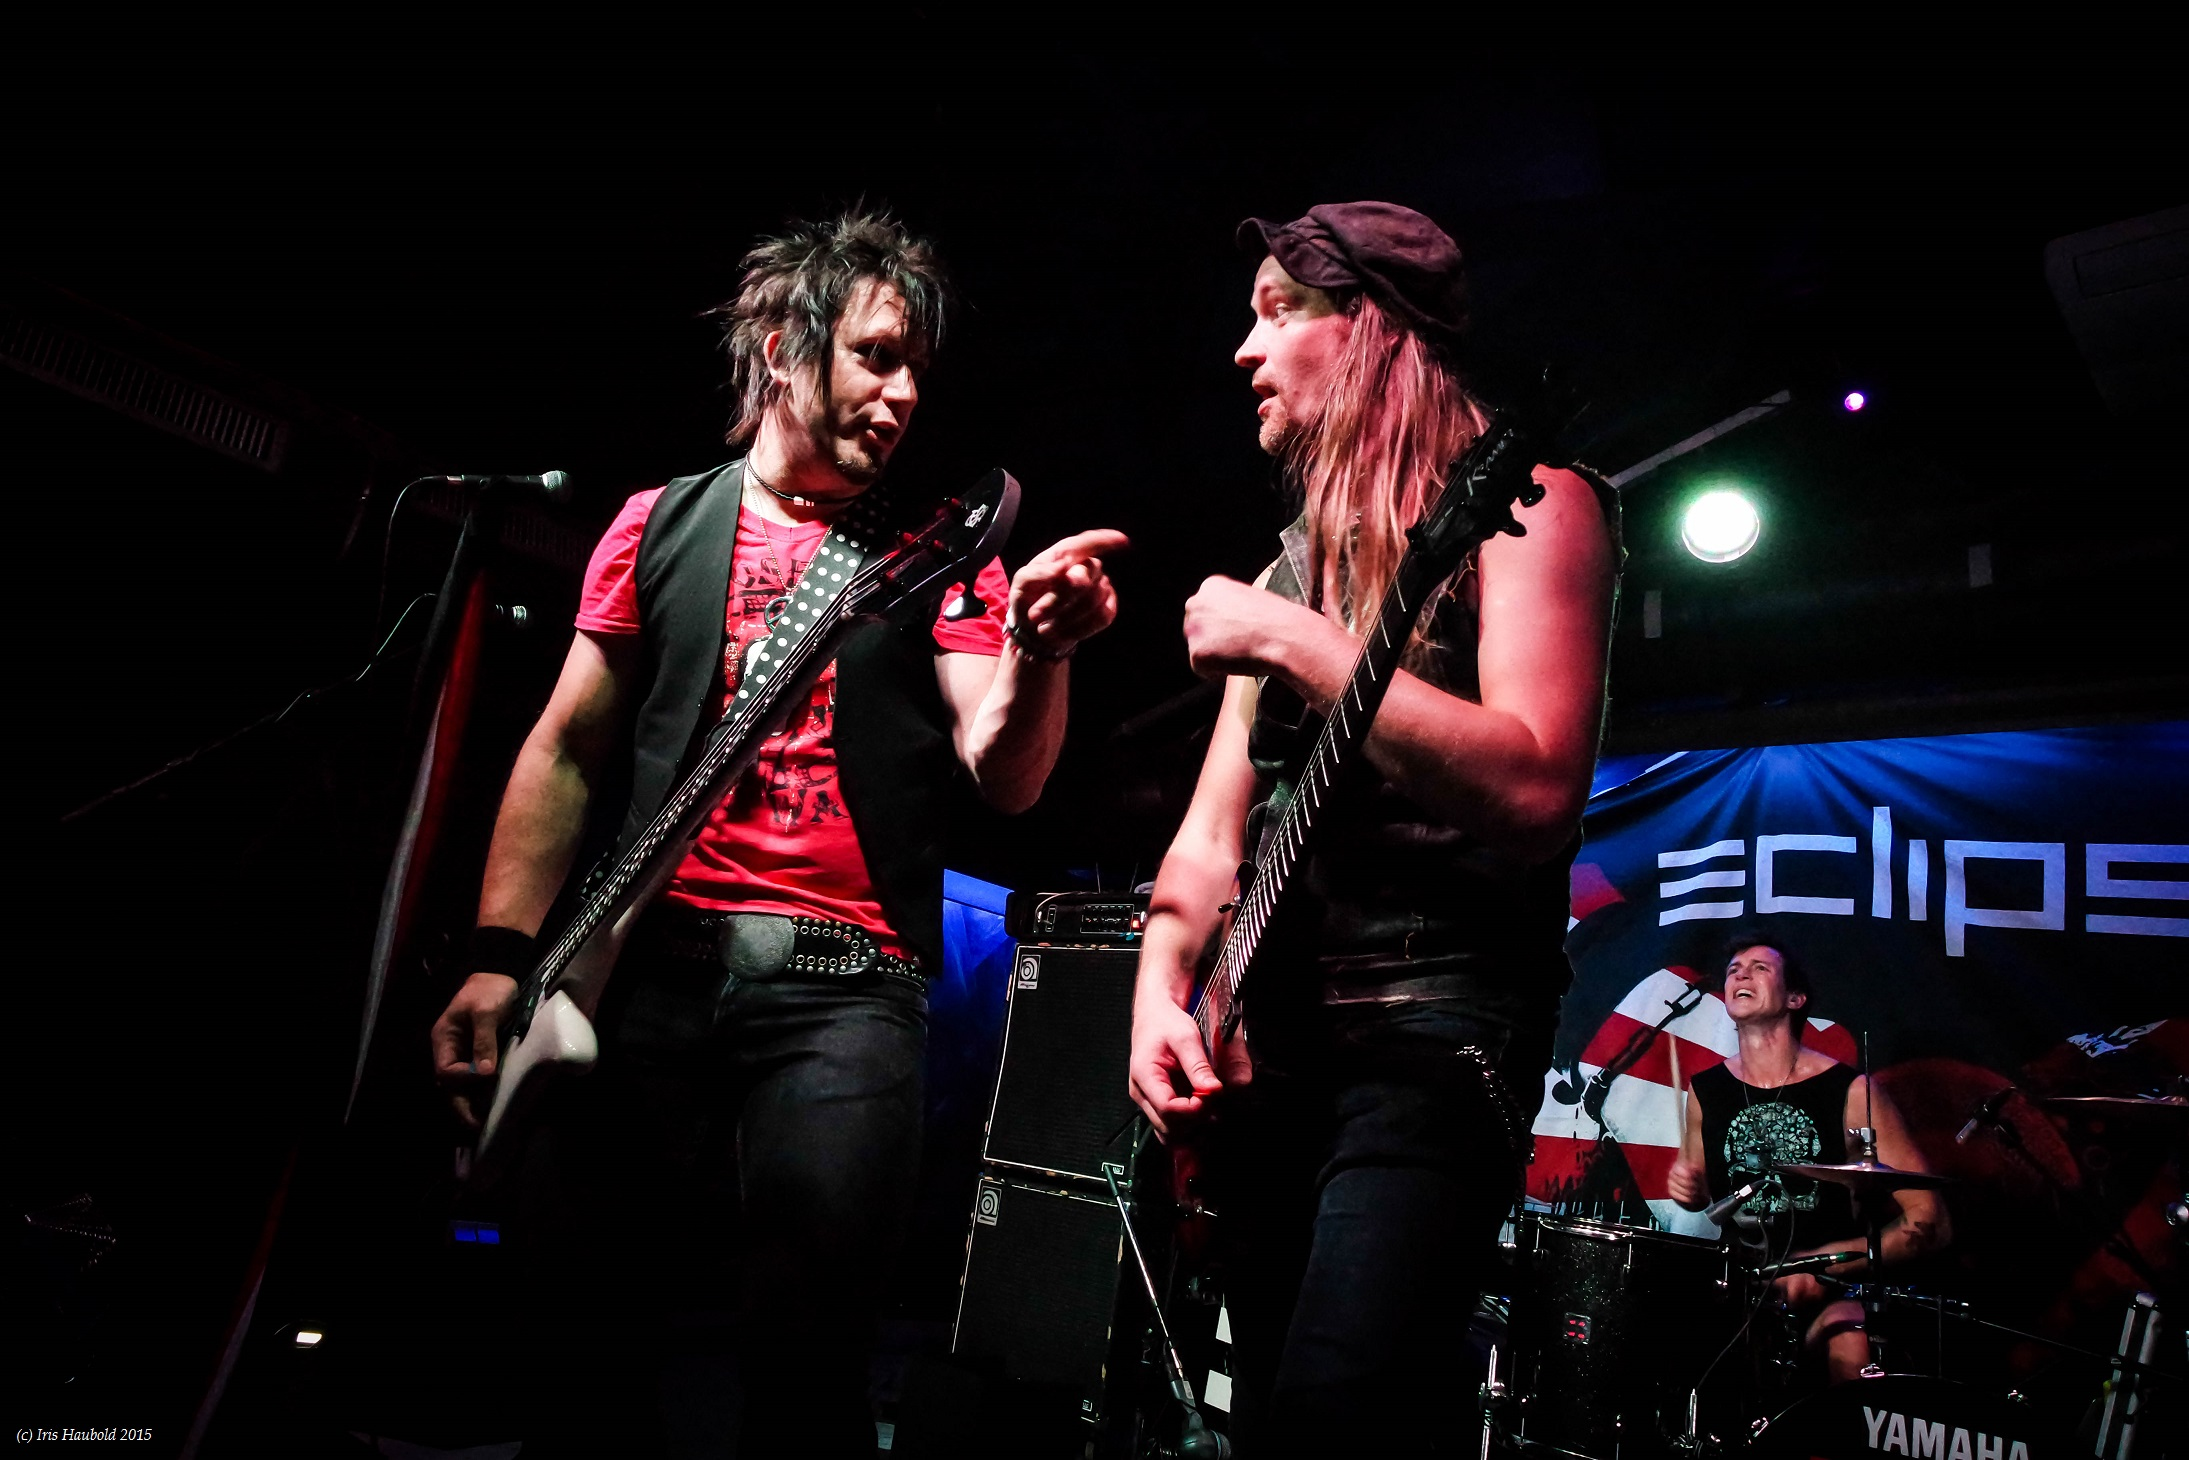 Eclipse Rockfabrik 2015